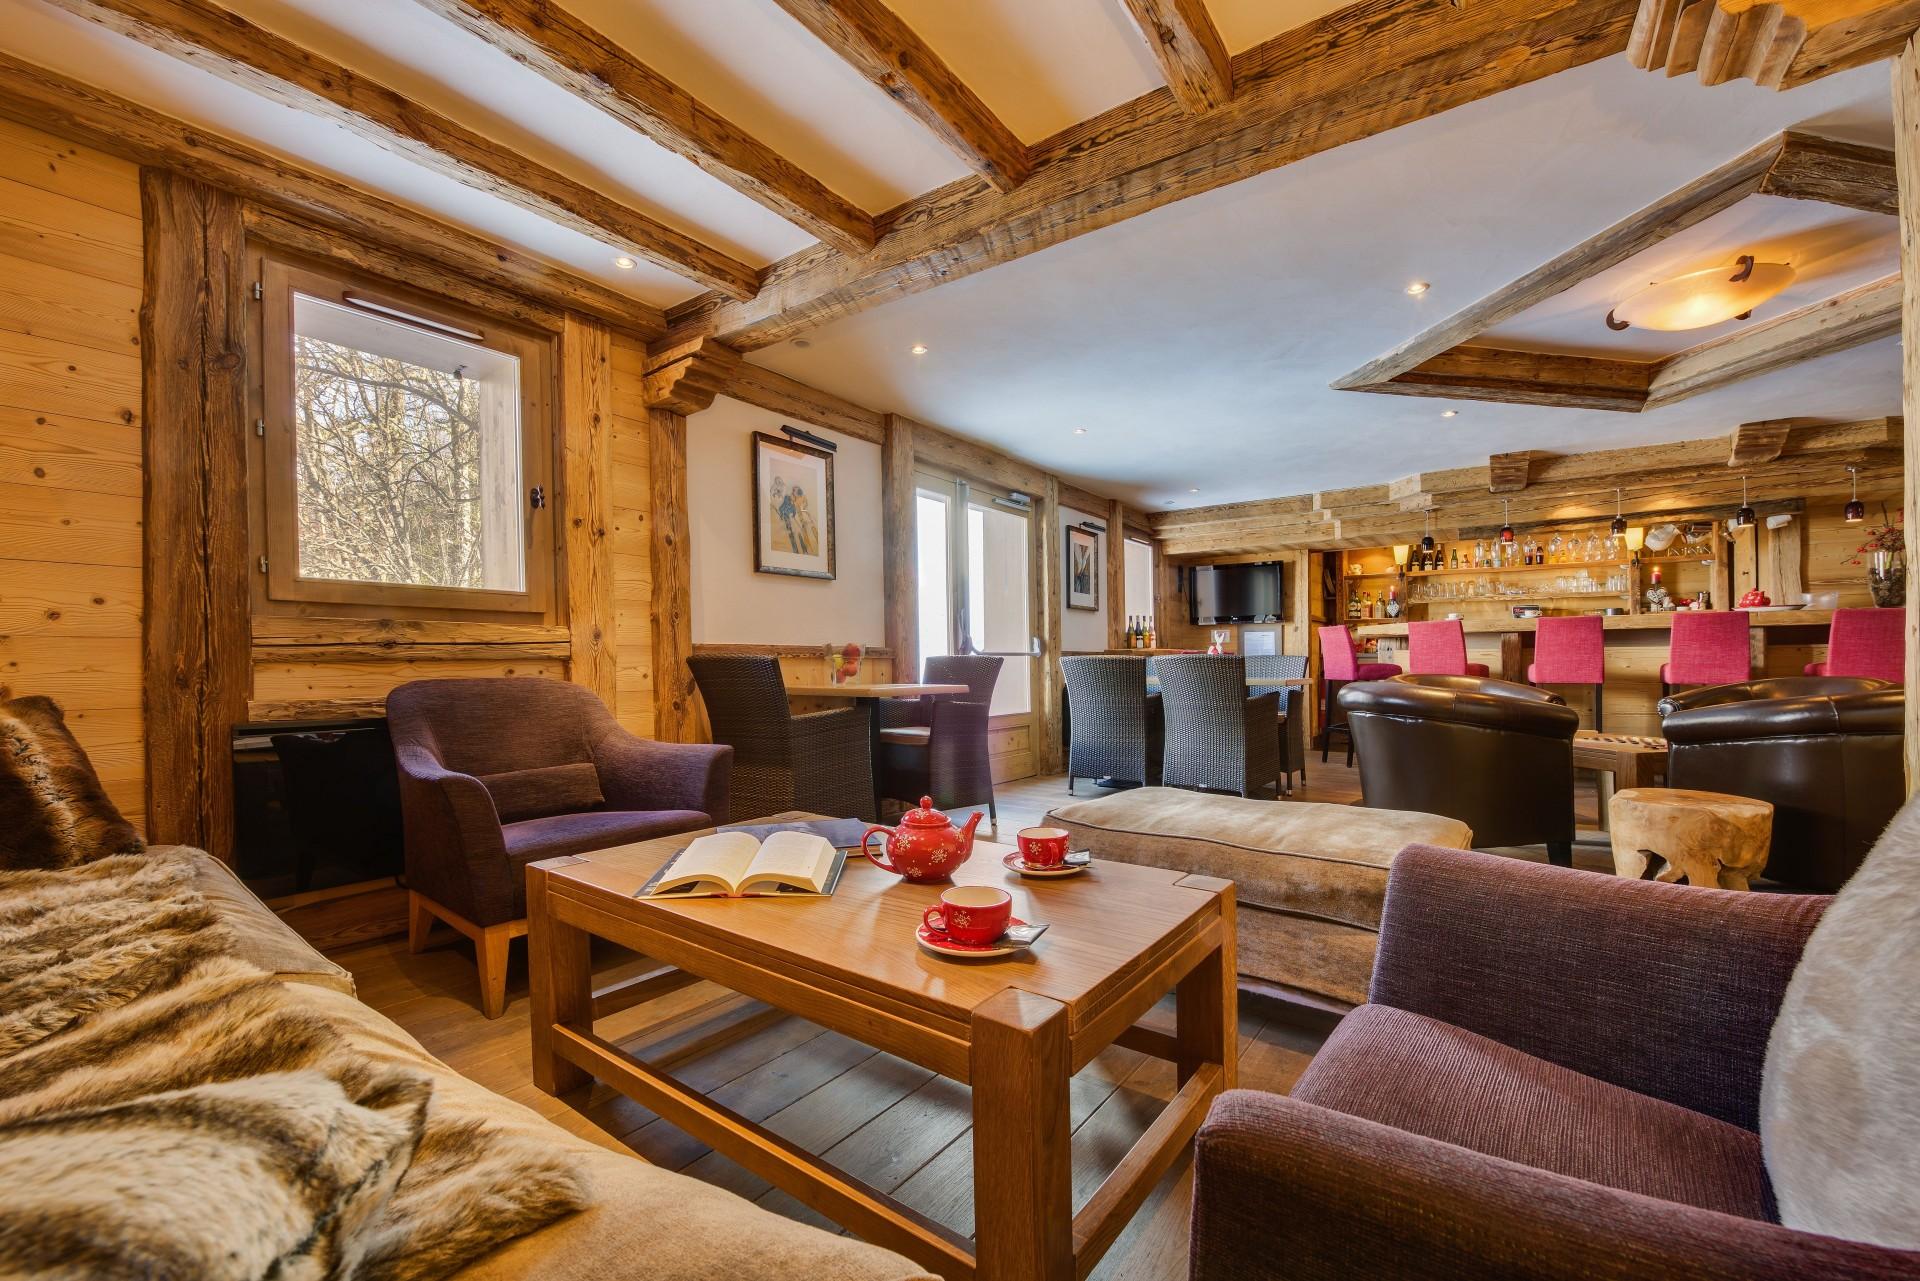 Sainte Foy Tarentaise Location Appartement Luxe Ronite Réception 1